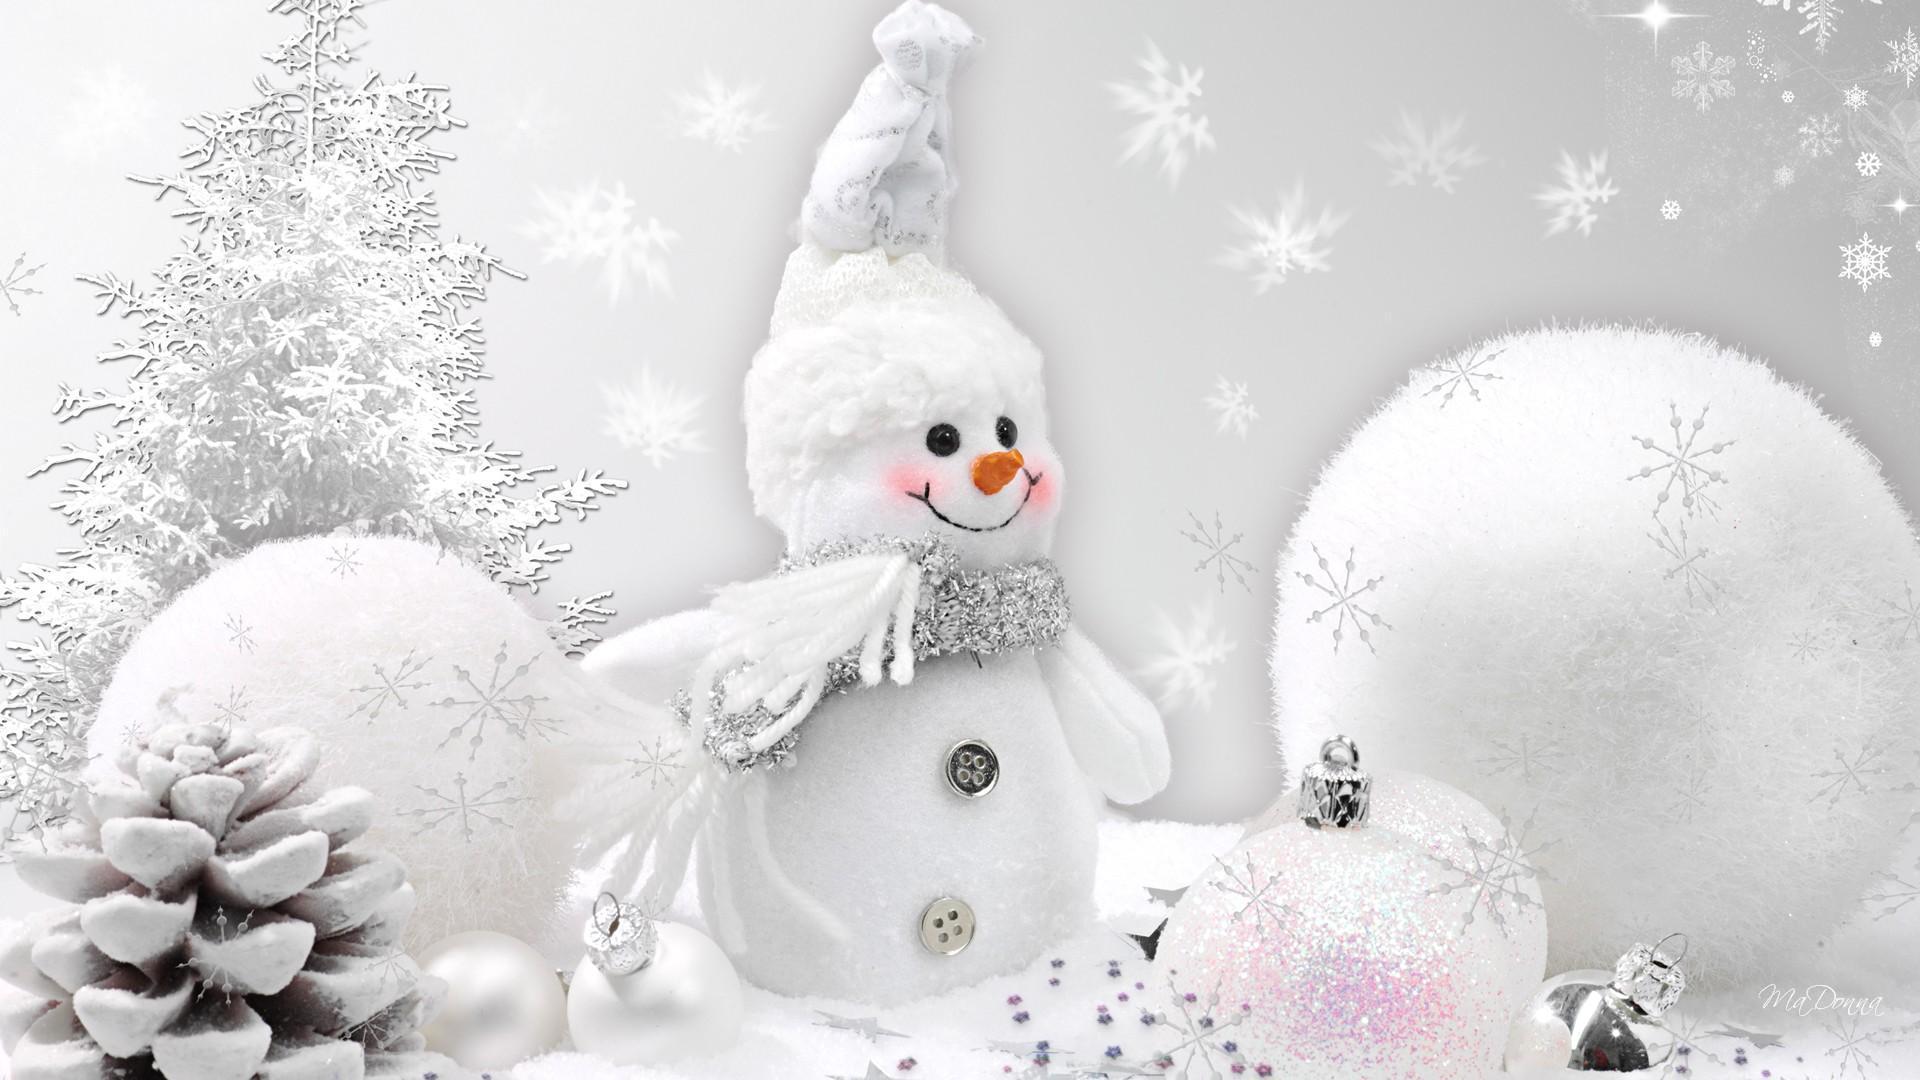 Christmas Snowman Wallpapers Top Free Christmas Snowman